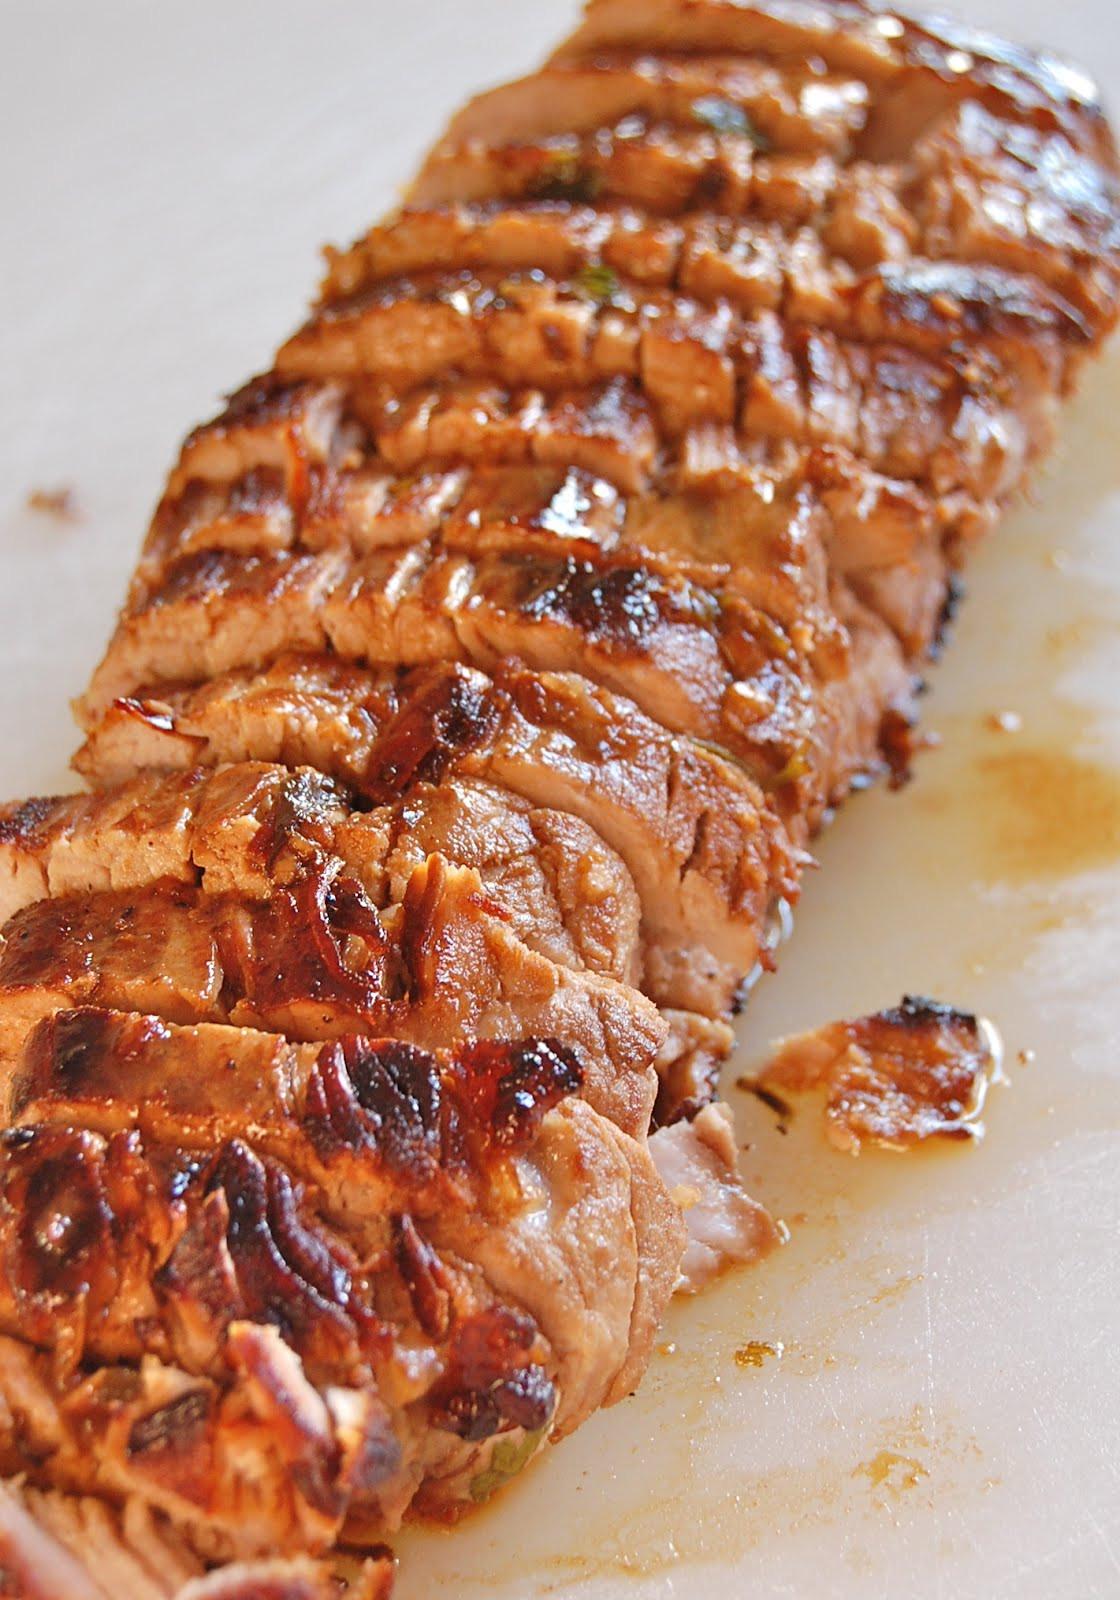 Easy Sauces For Pork Tenderloin  Grilled Pork Tenderloin with Gravy Pan Sauce – Best Quick